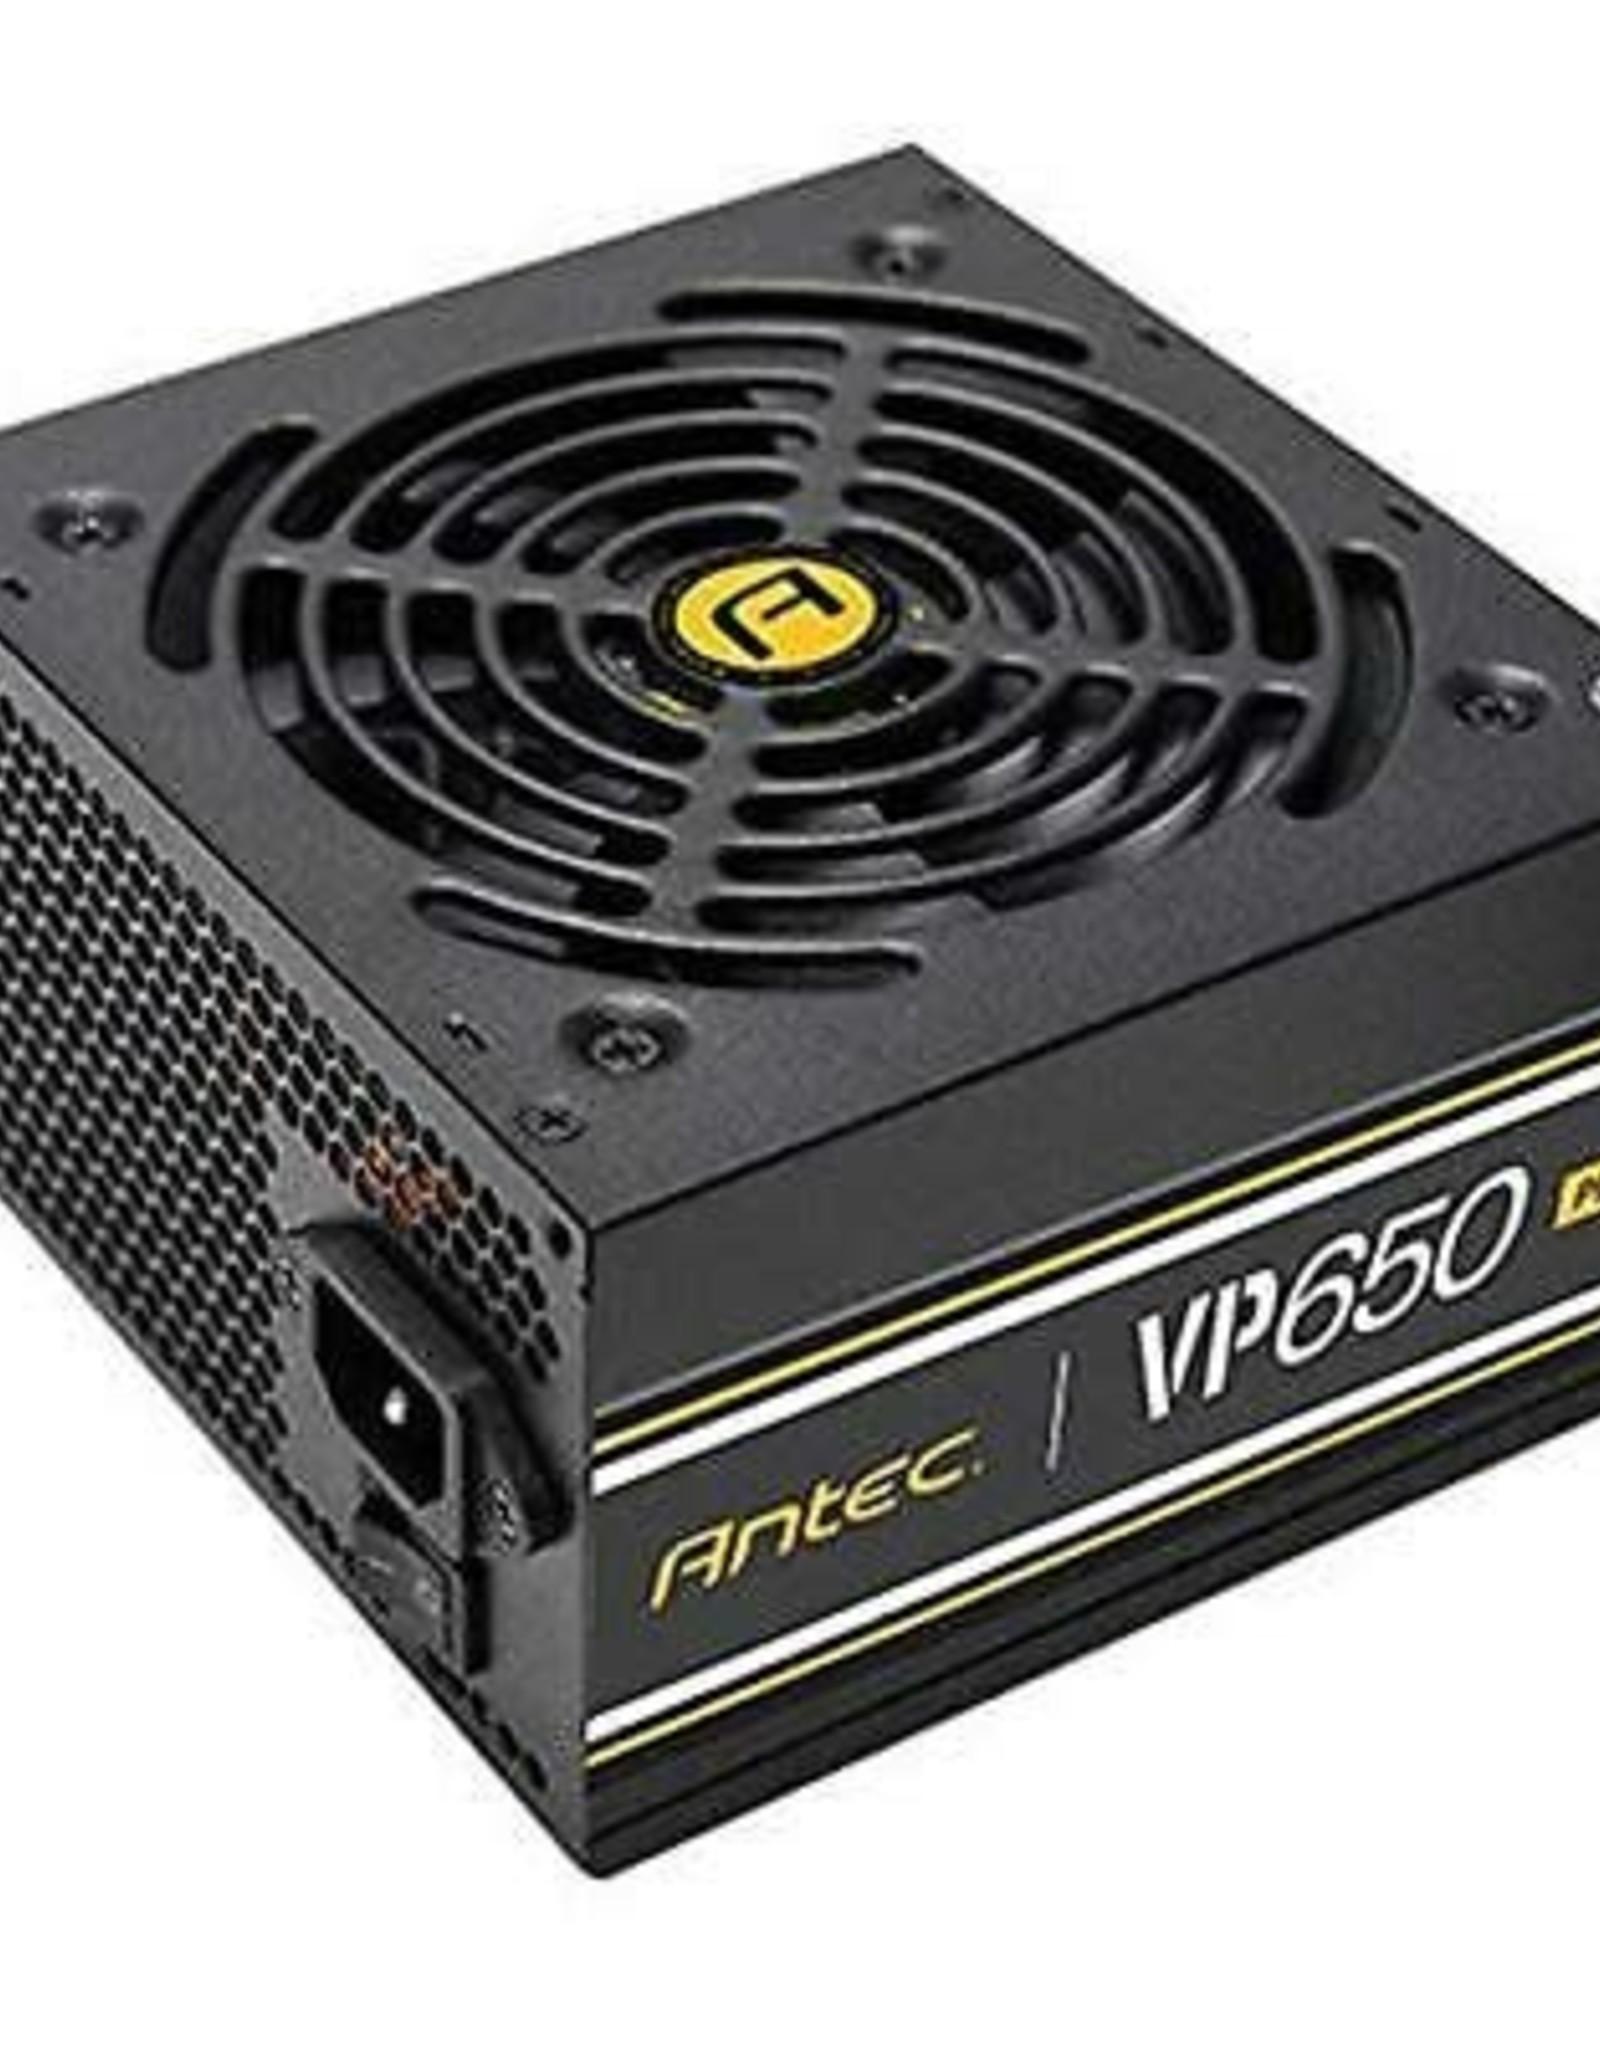 Antec | Power Supply 650W 80+ EPS 12V 120mm Silent Fan PCI-Express SATA Active PFC NonModular VP650 PLUS